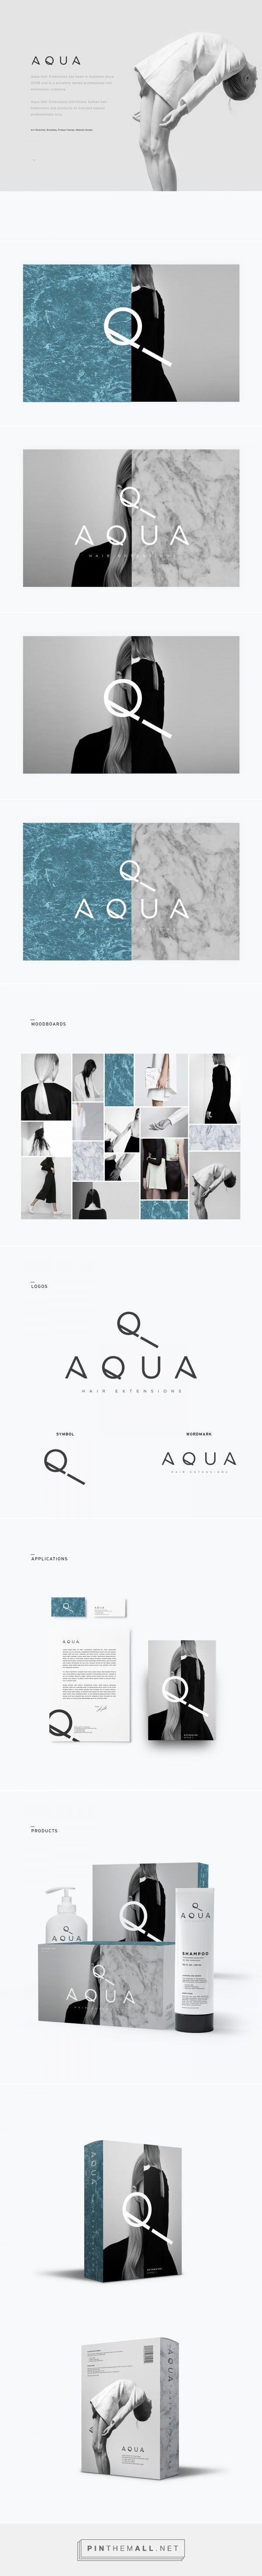 Aqua - Hair Extensions on Behance {cT}